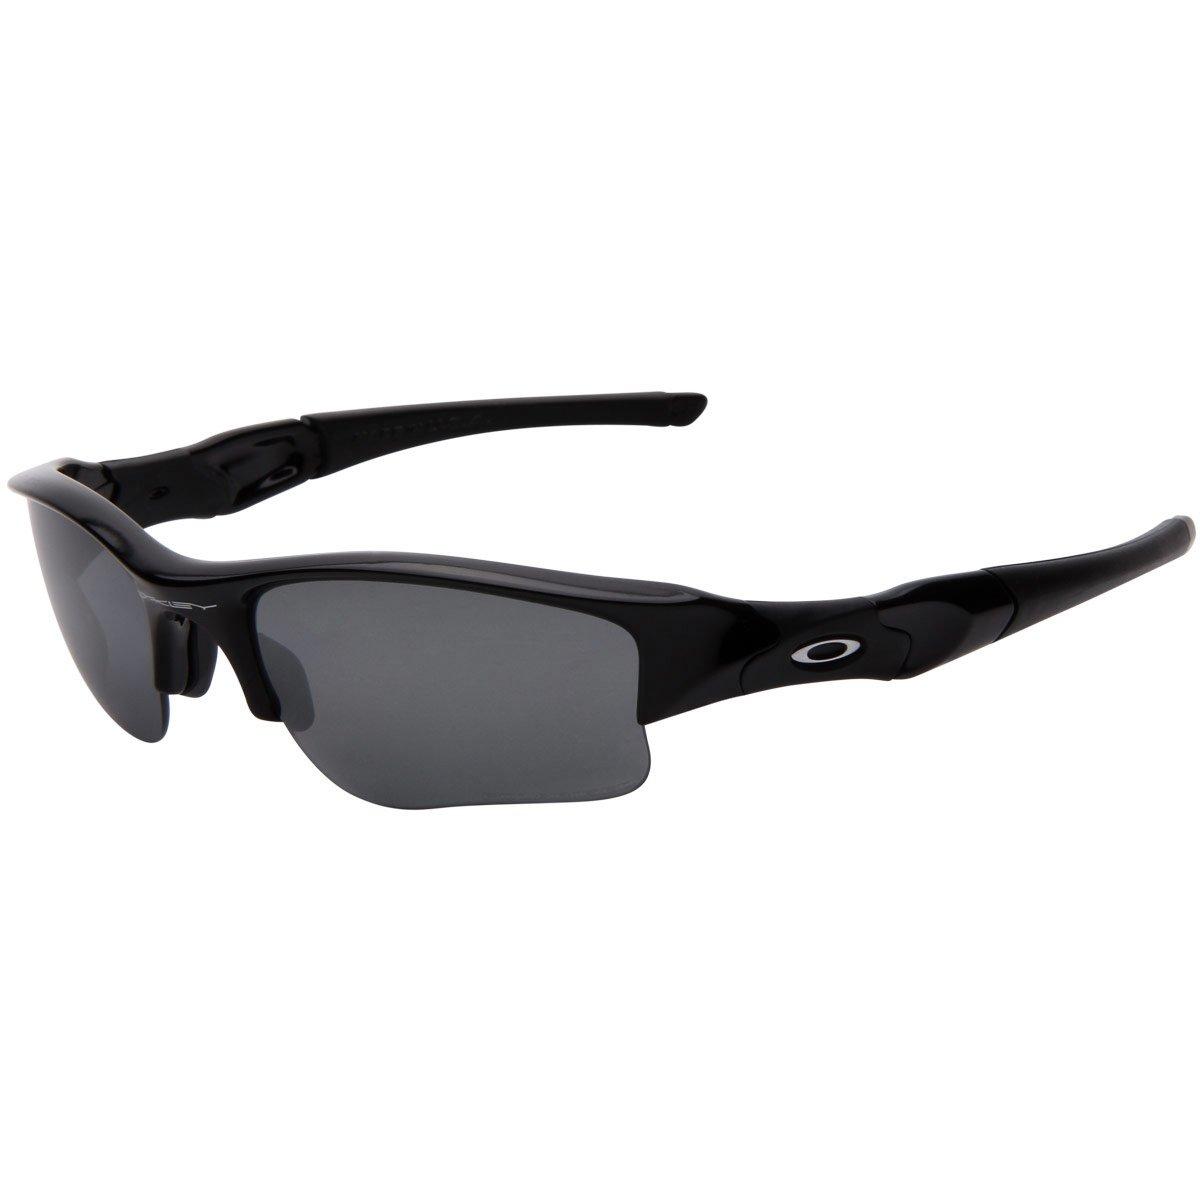 b7161f8ad50dc Óculos Oakley Flak Jacket XLJ - Polarizado - Compre Agora